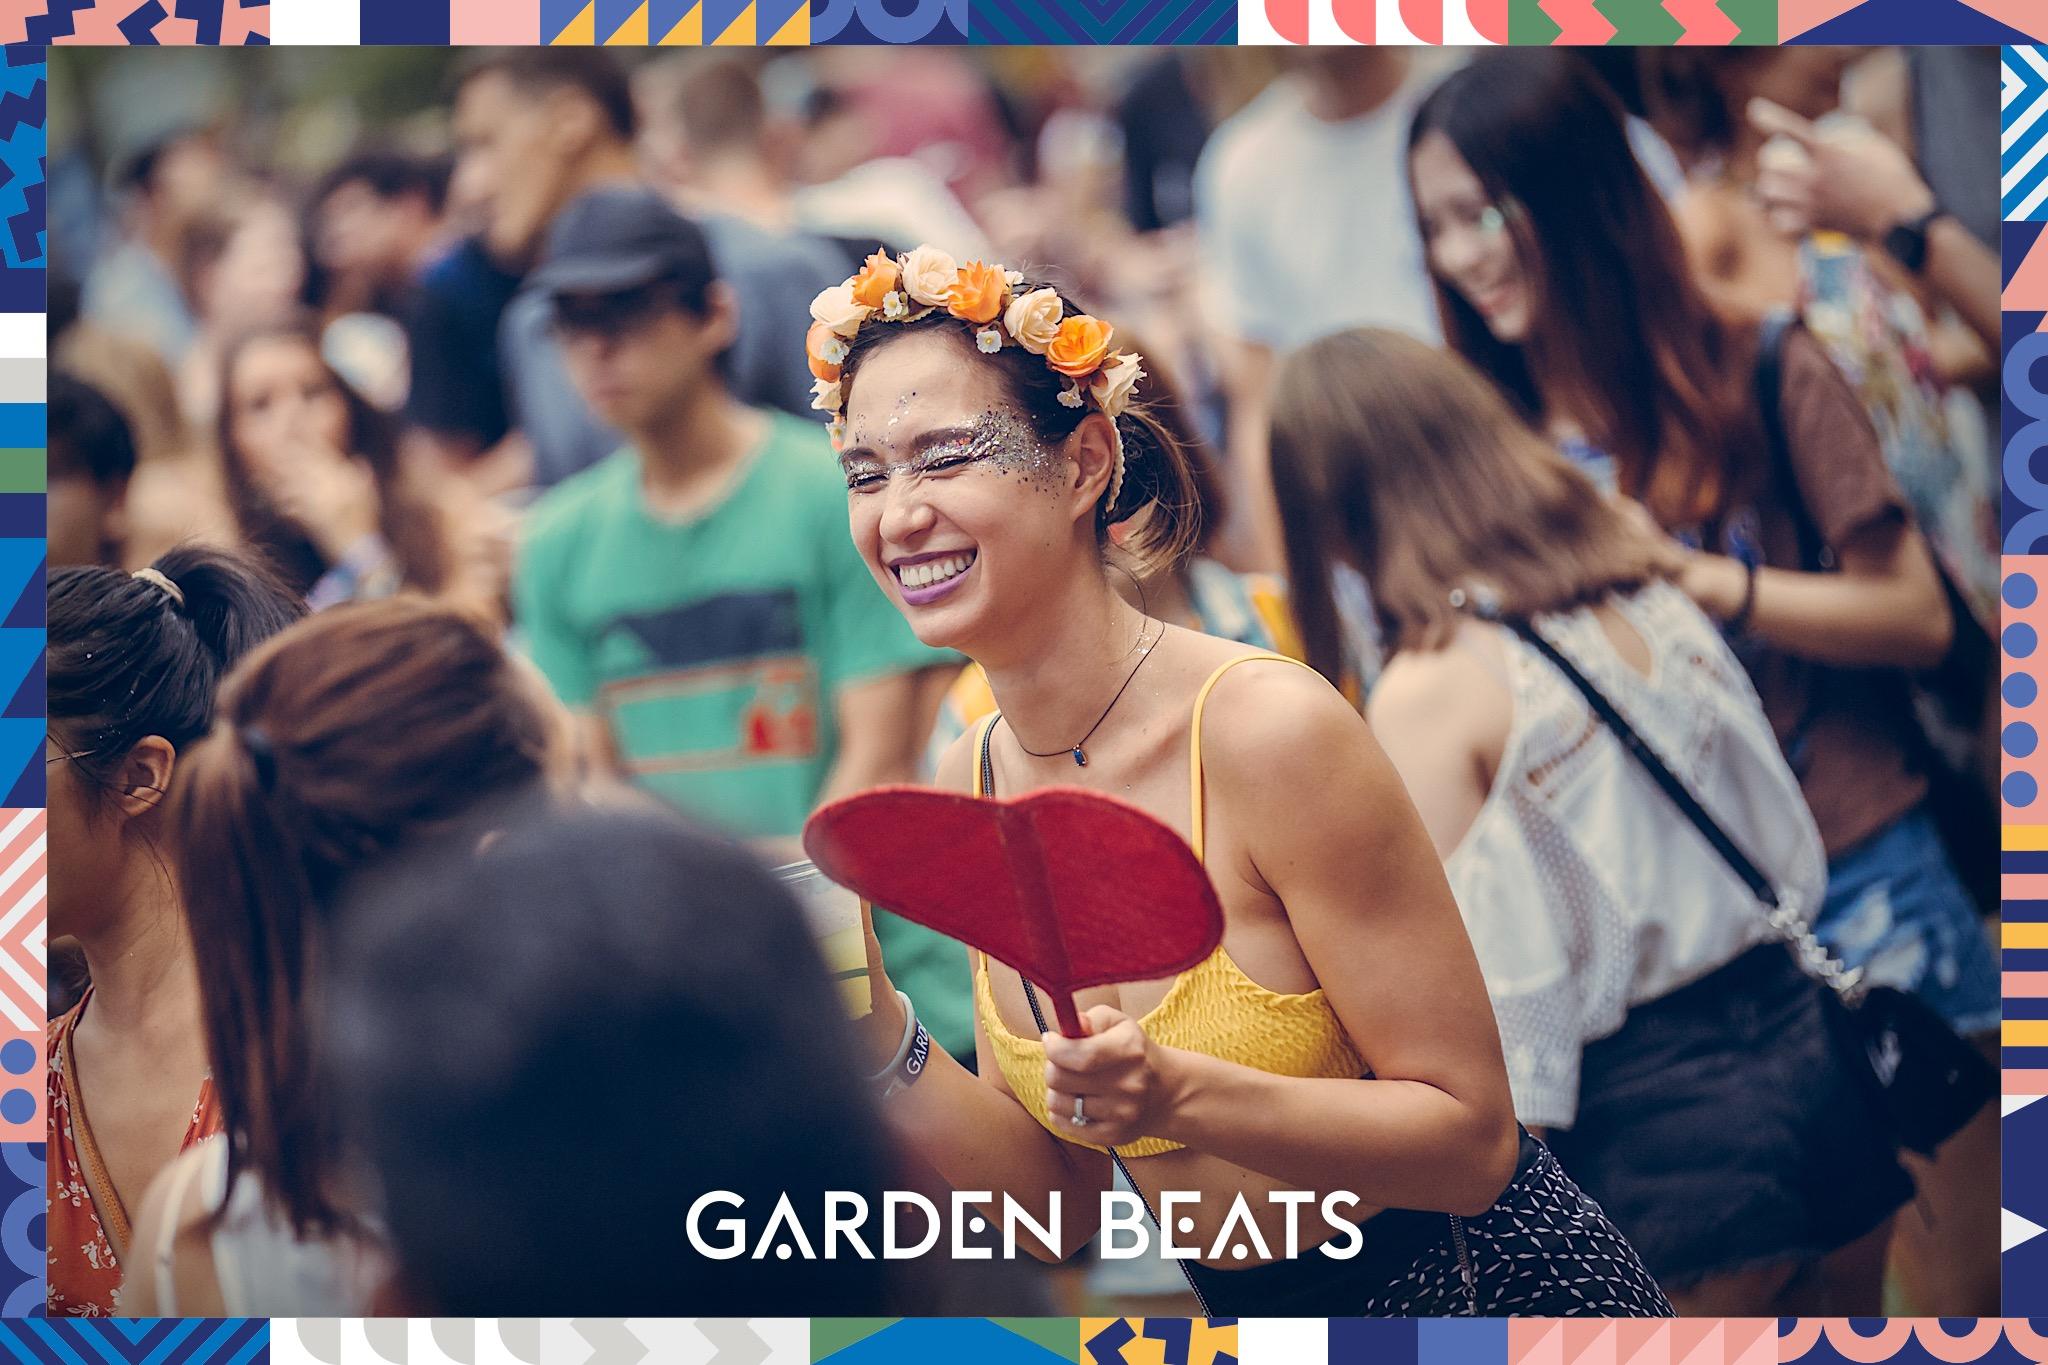 03032018_GardenBeats_Colossal589_Watermarked.jpg